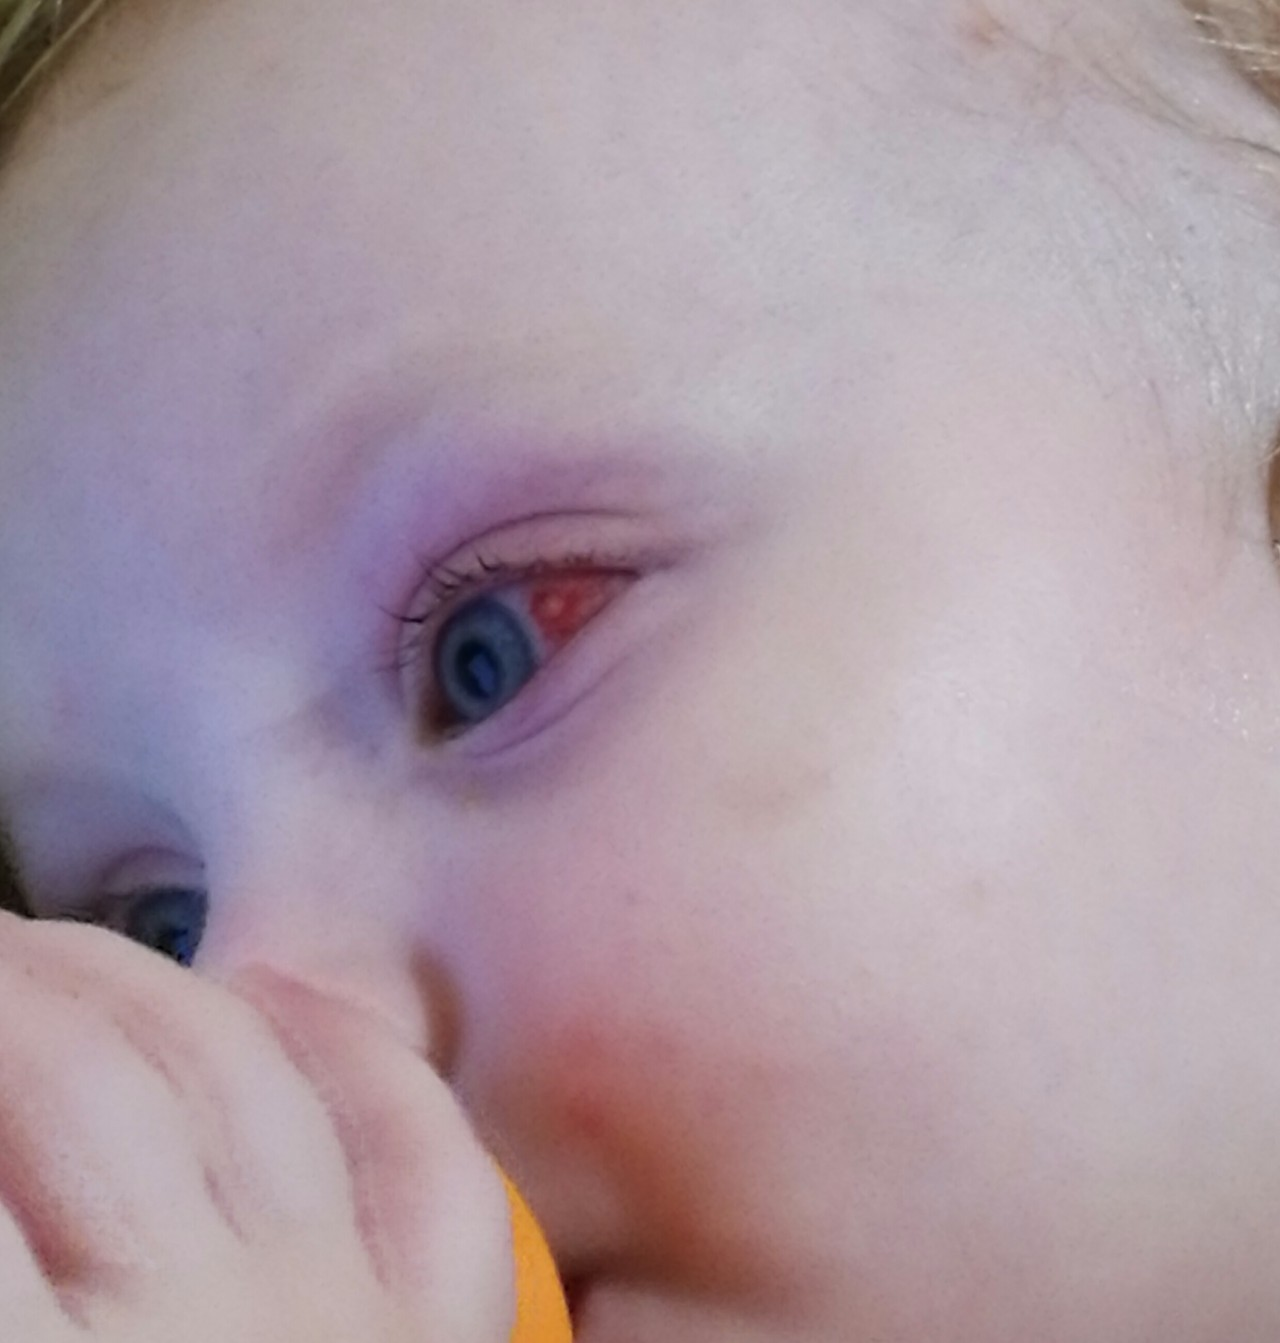 Конъюнктивит глаз у детей до года фото